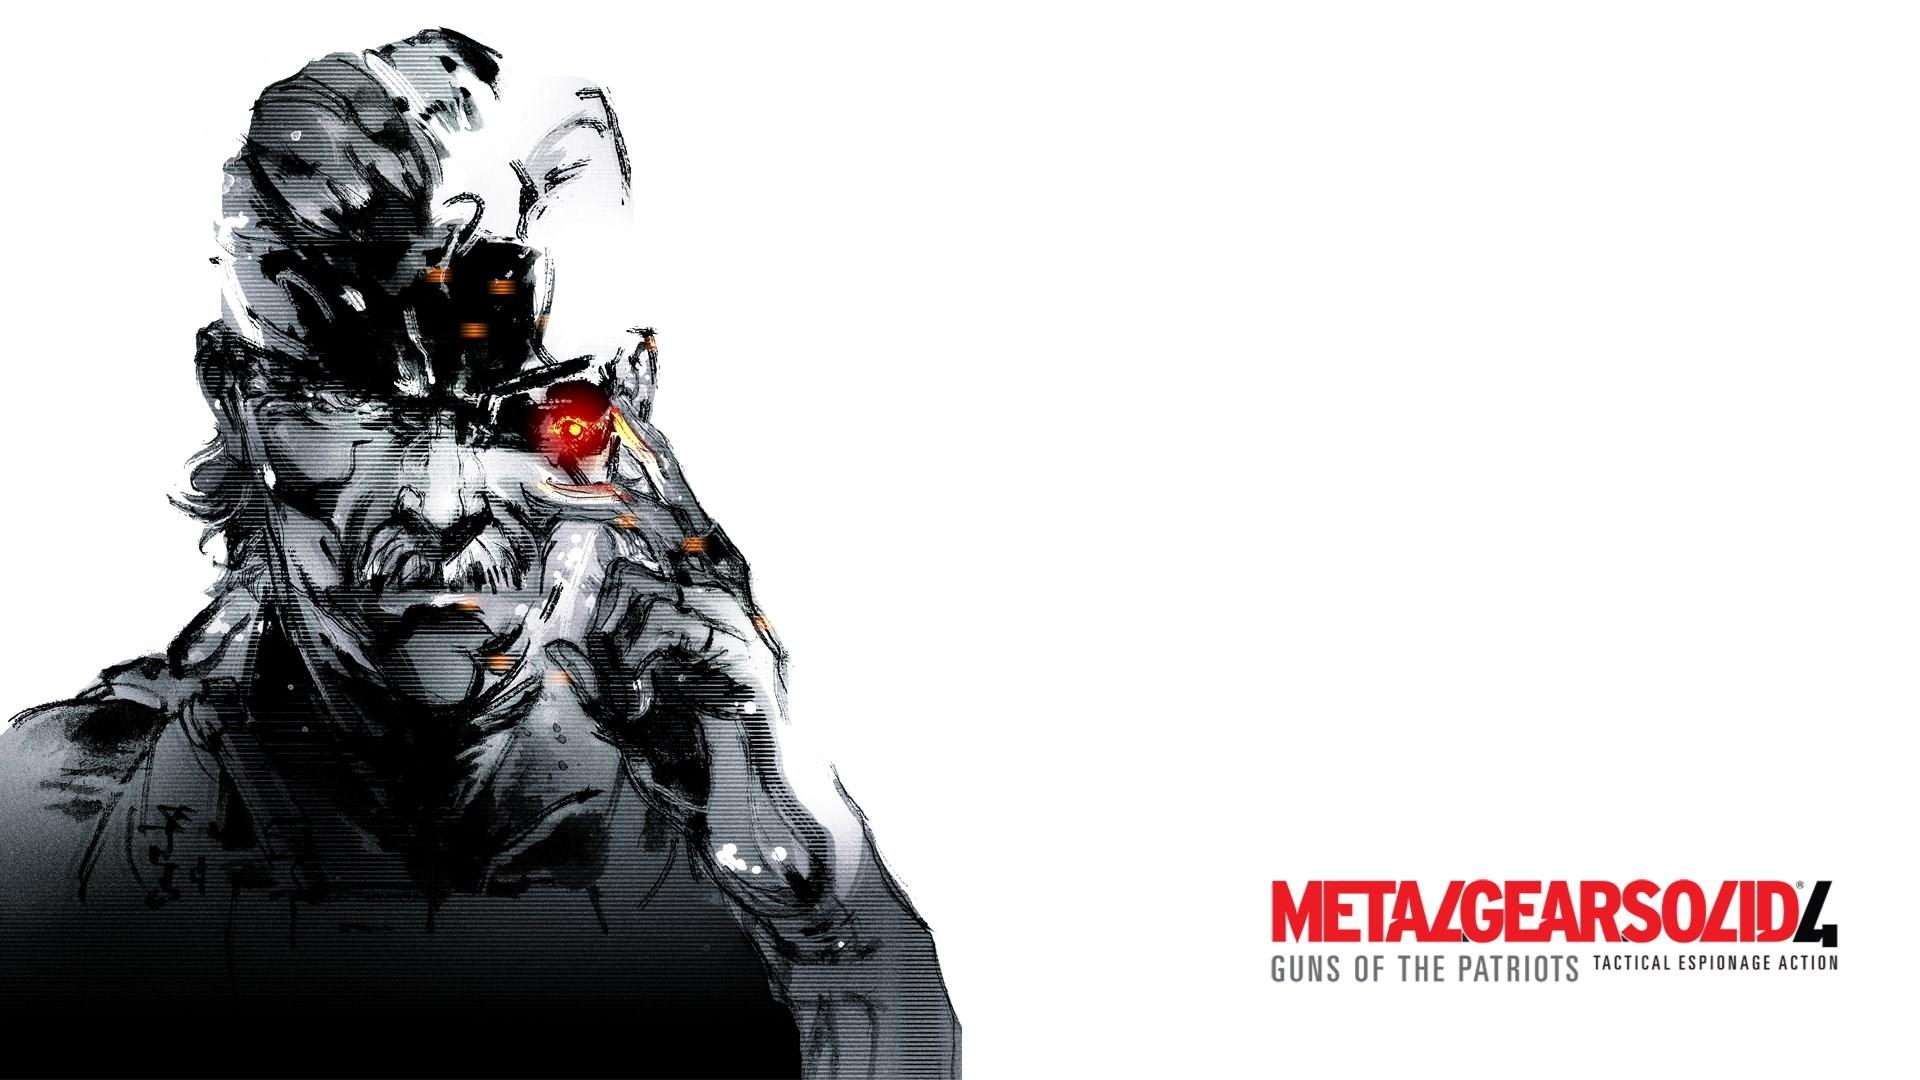 Metal Gear Solid Artwork 1080p Backgrounds Album On Imgur Desktop